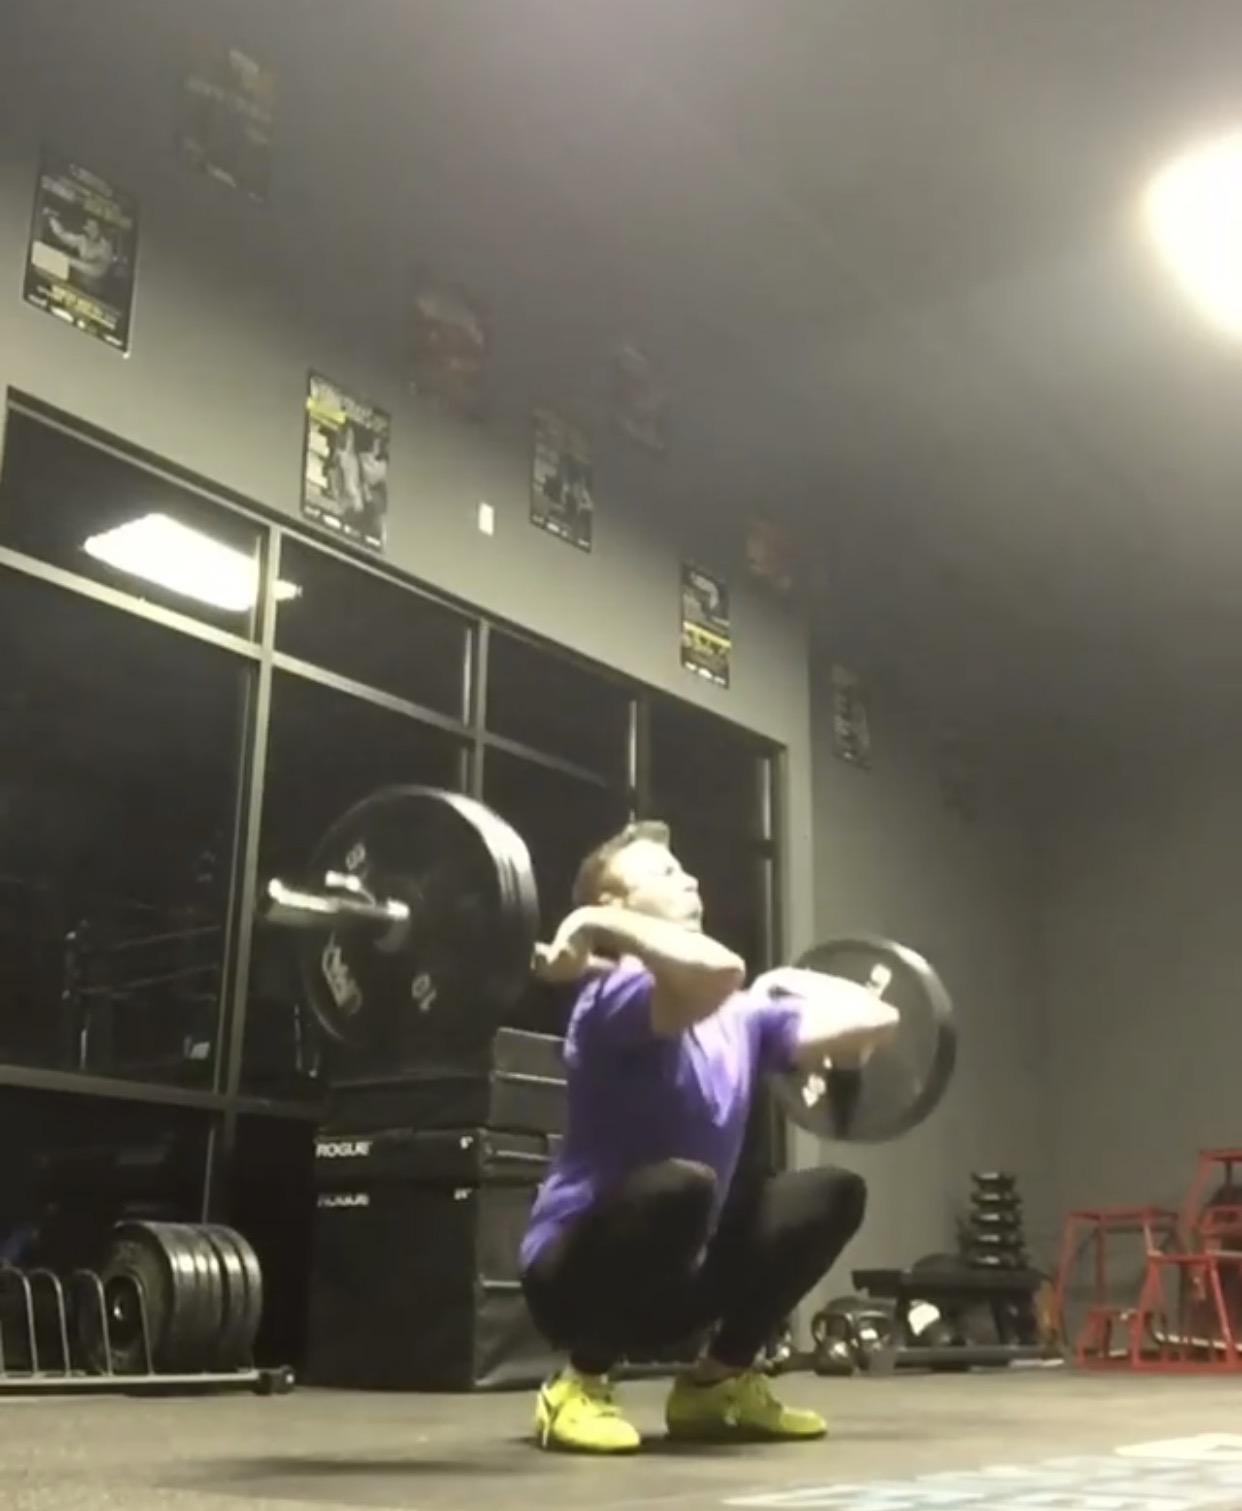 Matt W.- Weightlifting - Before 1st AttemptSnatch: 80kgClean and Jerk: 94kgBack Squat: 111kgFront Squat: 90kgWith 1st Attempt:Snatch: 93kgClean and Jerk: 107kgBack Squat: 134kgFront Squat: 107kg